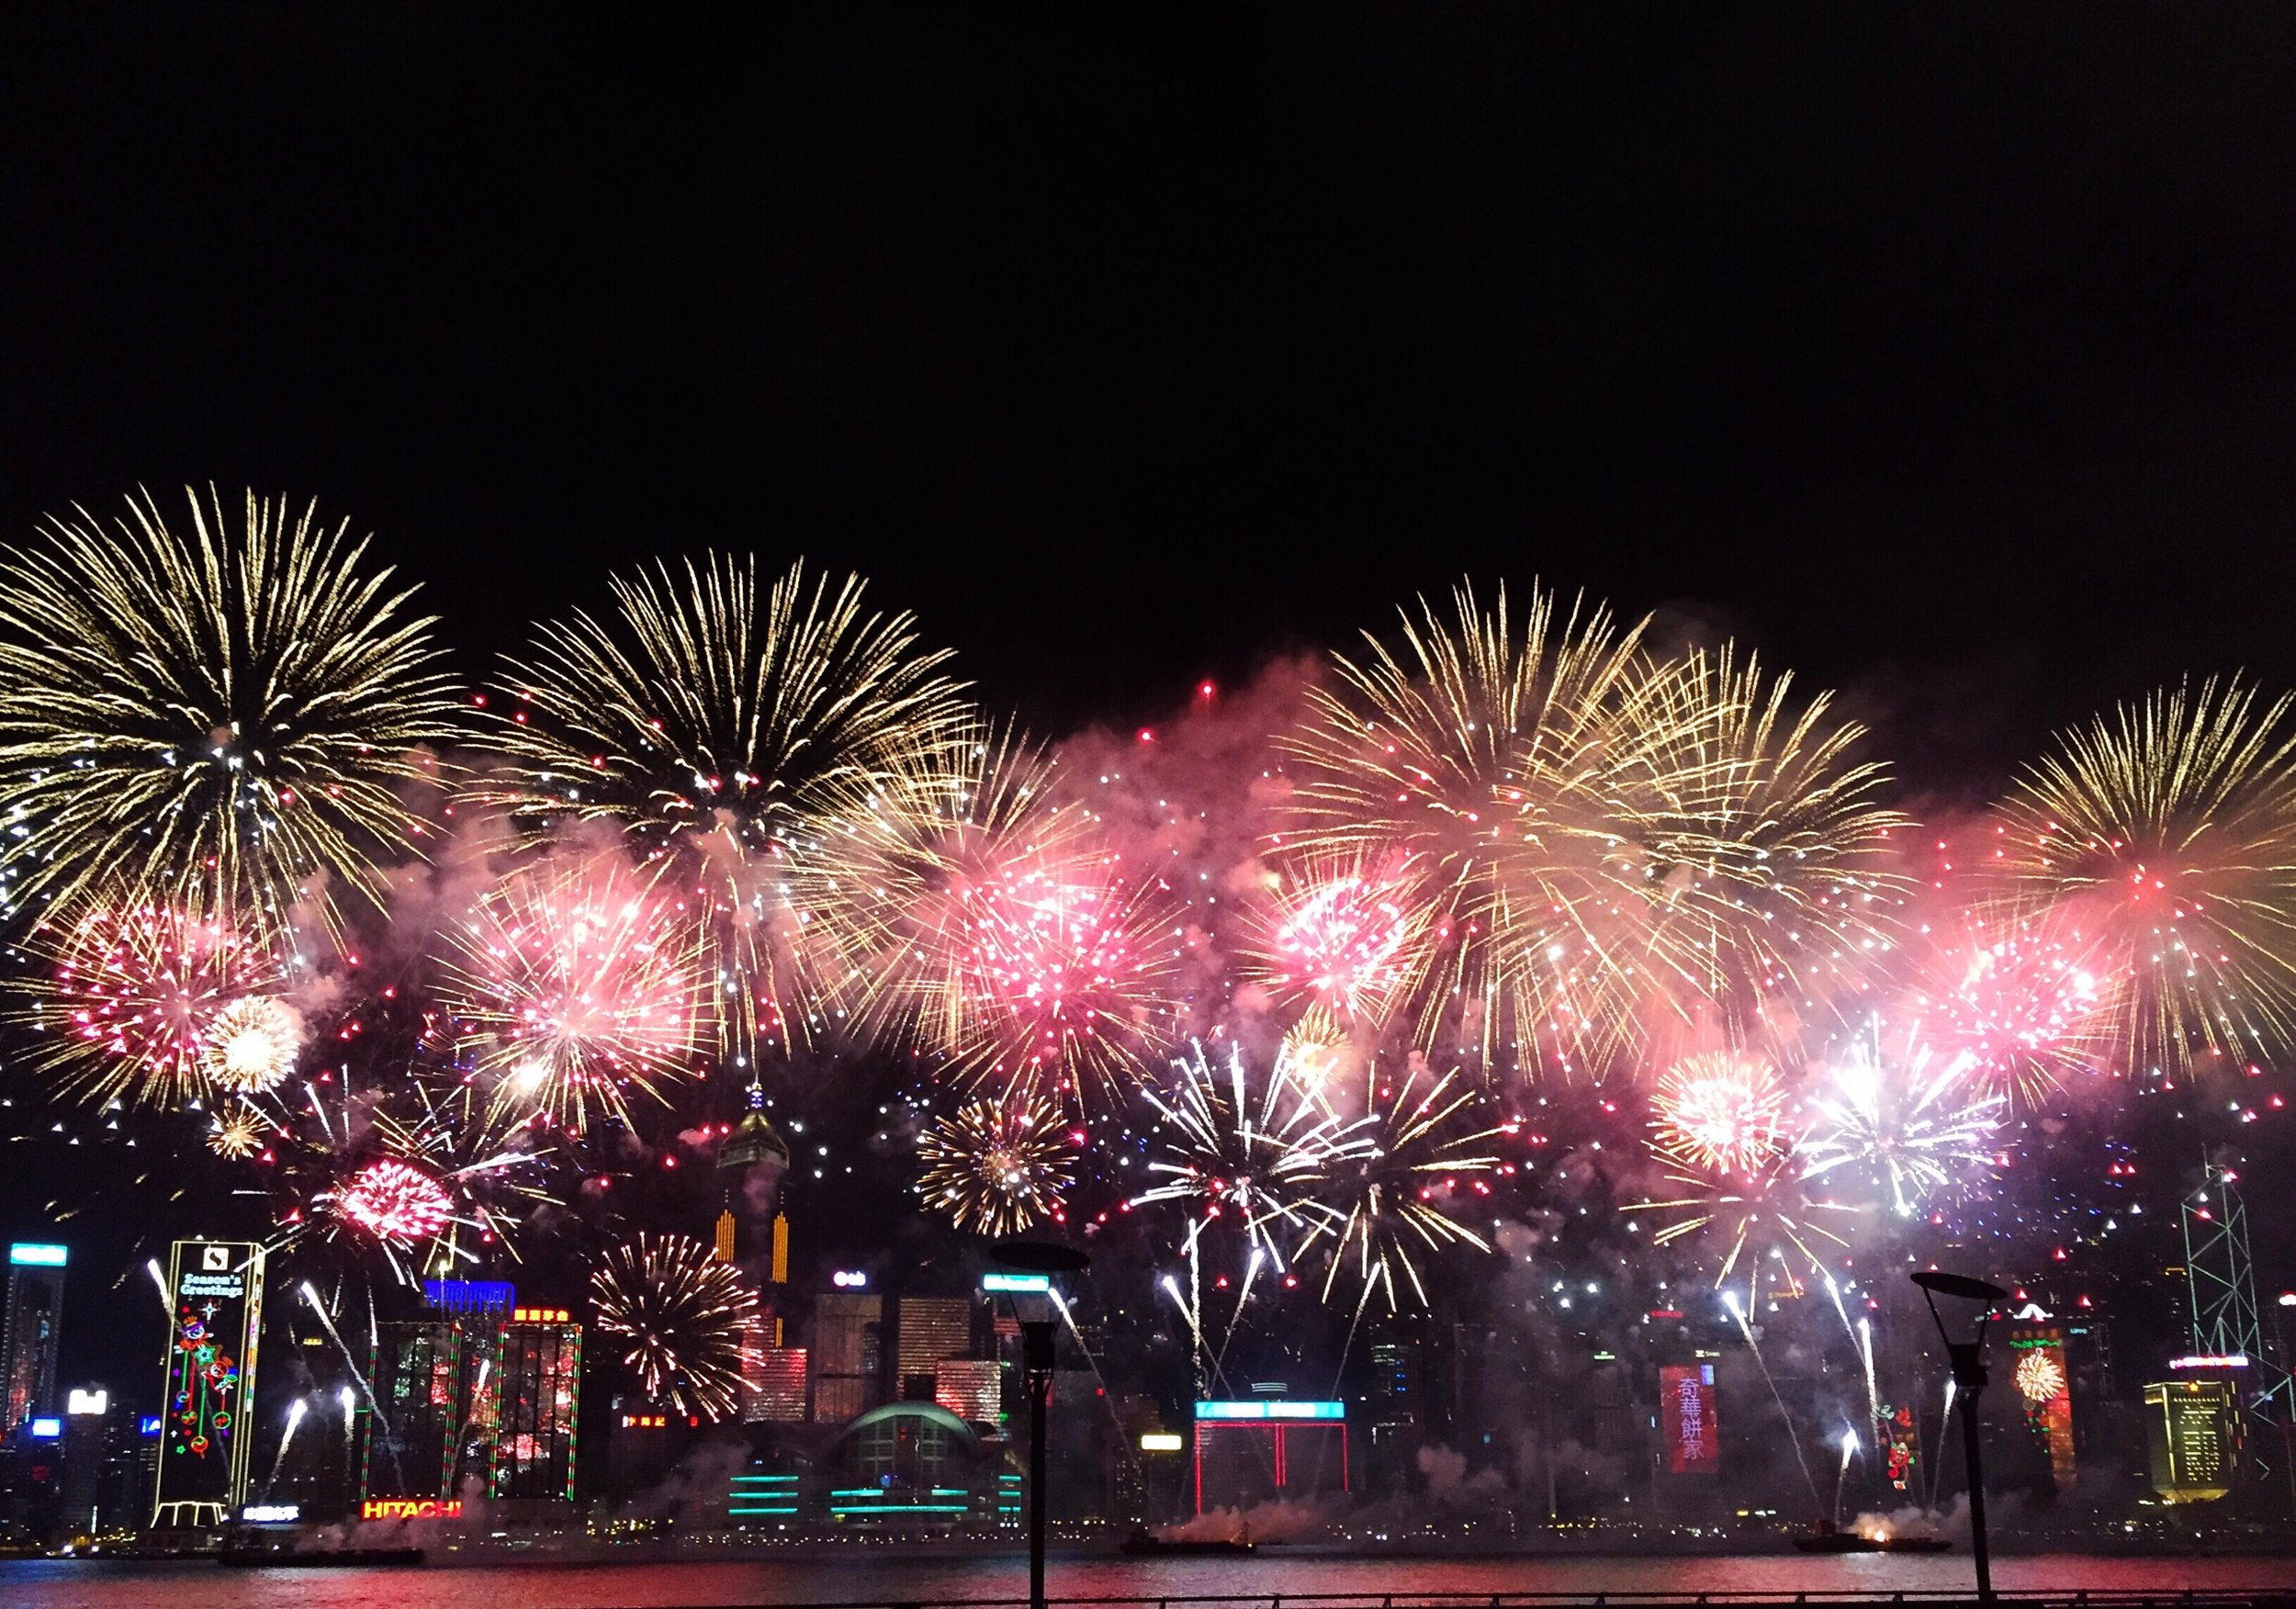 chinese-new-year-fireworks-hong-kong_t20_VKwBr3.jpg